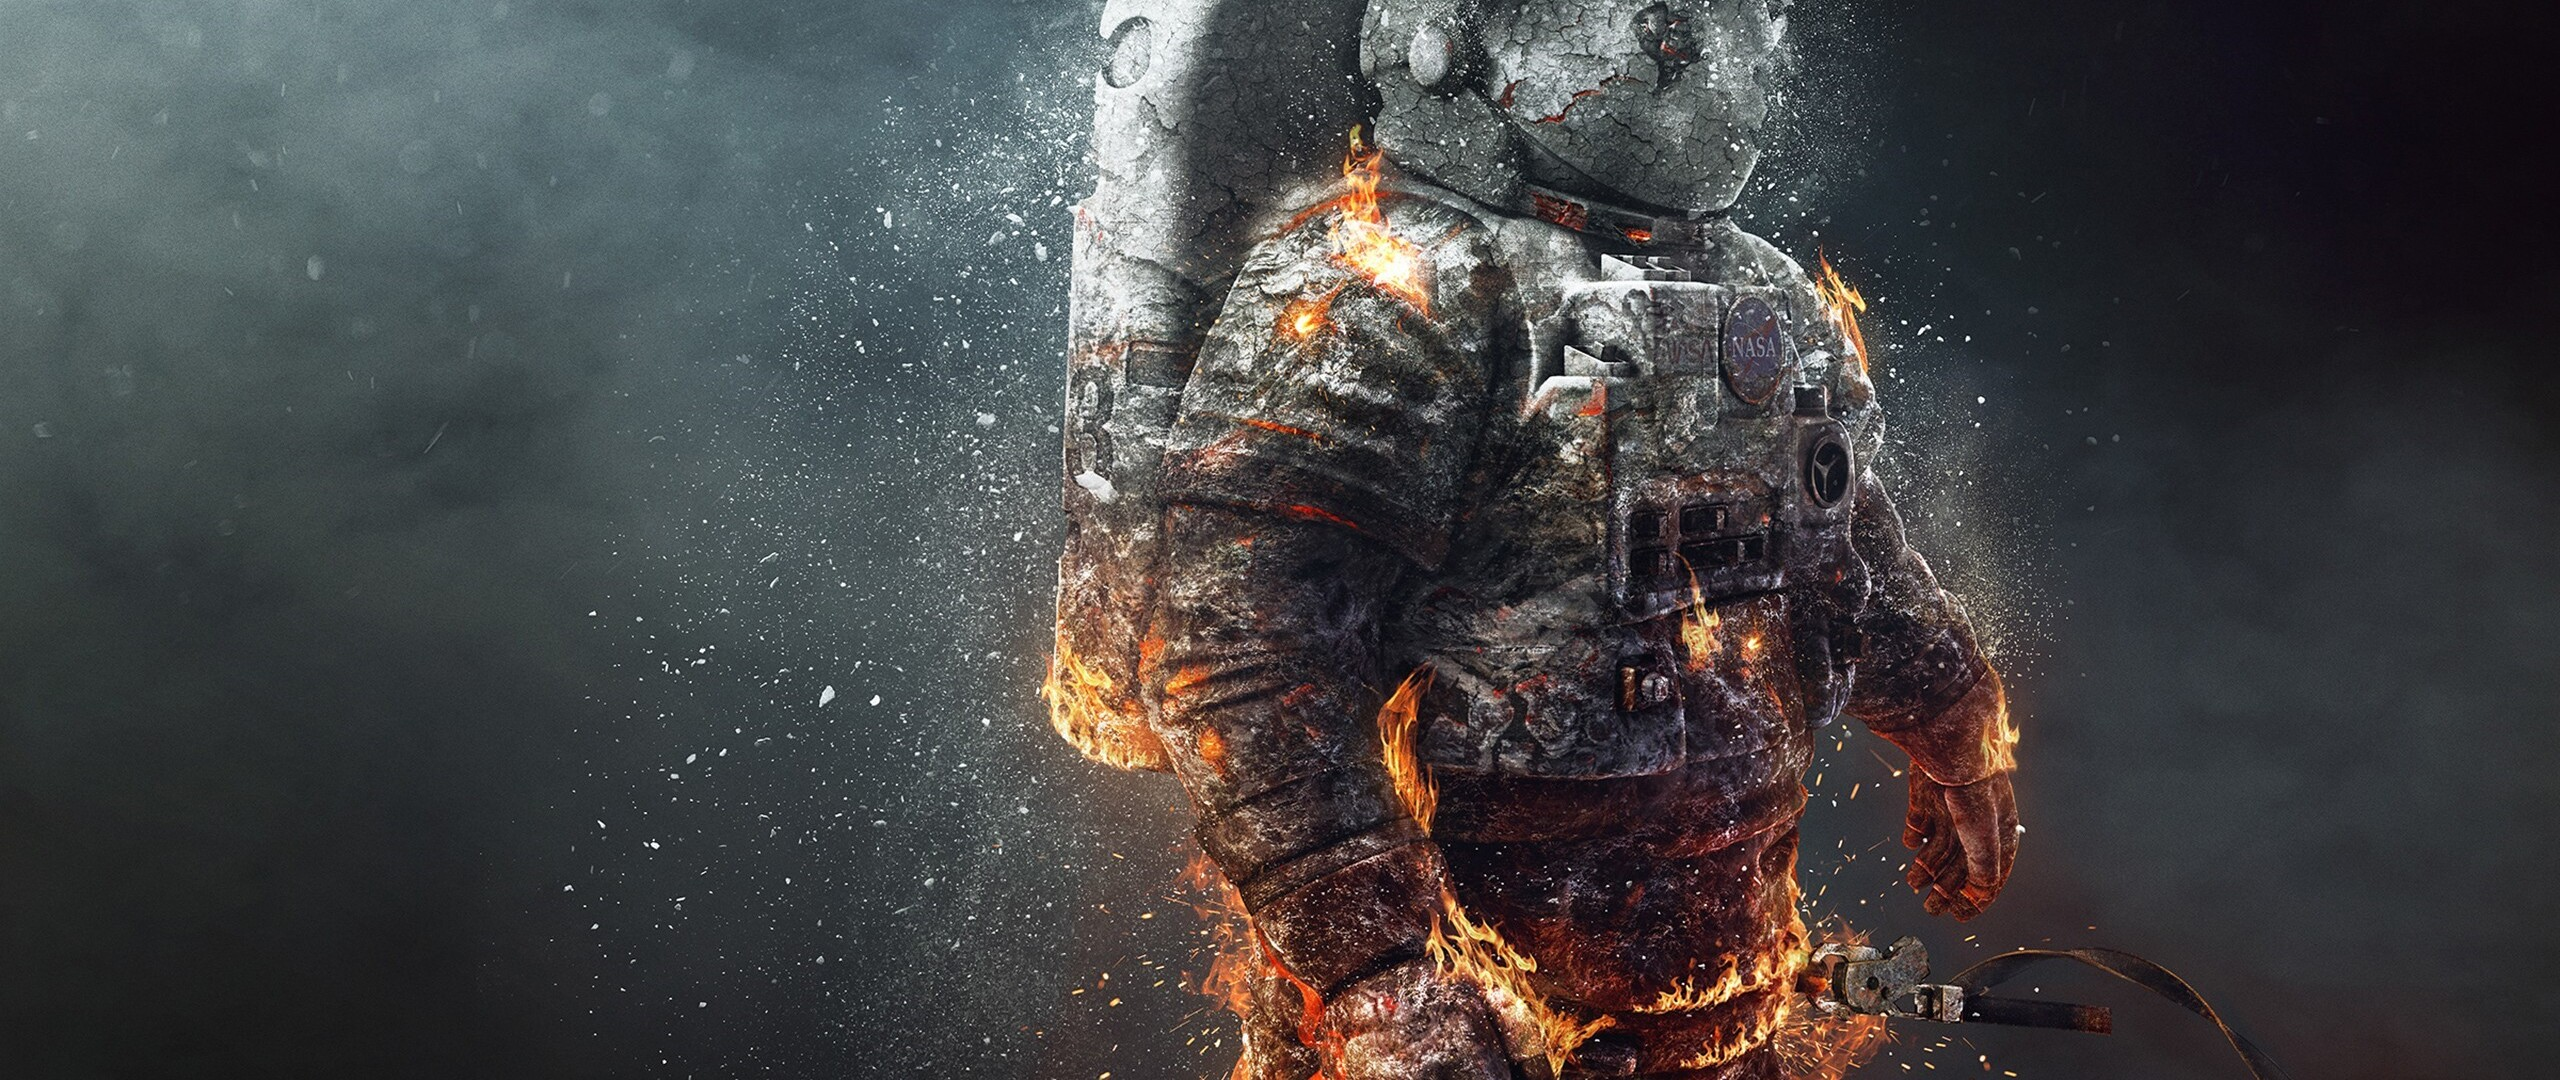 astronaut on fire - HD2560×1080